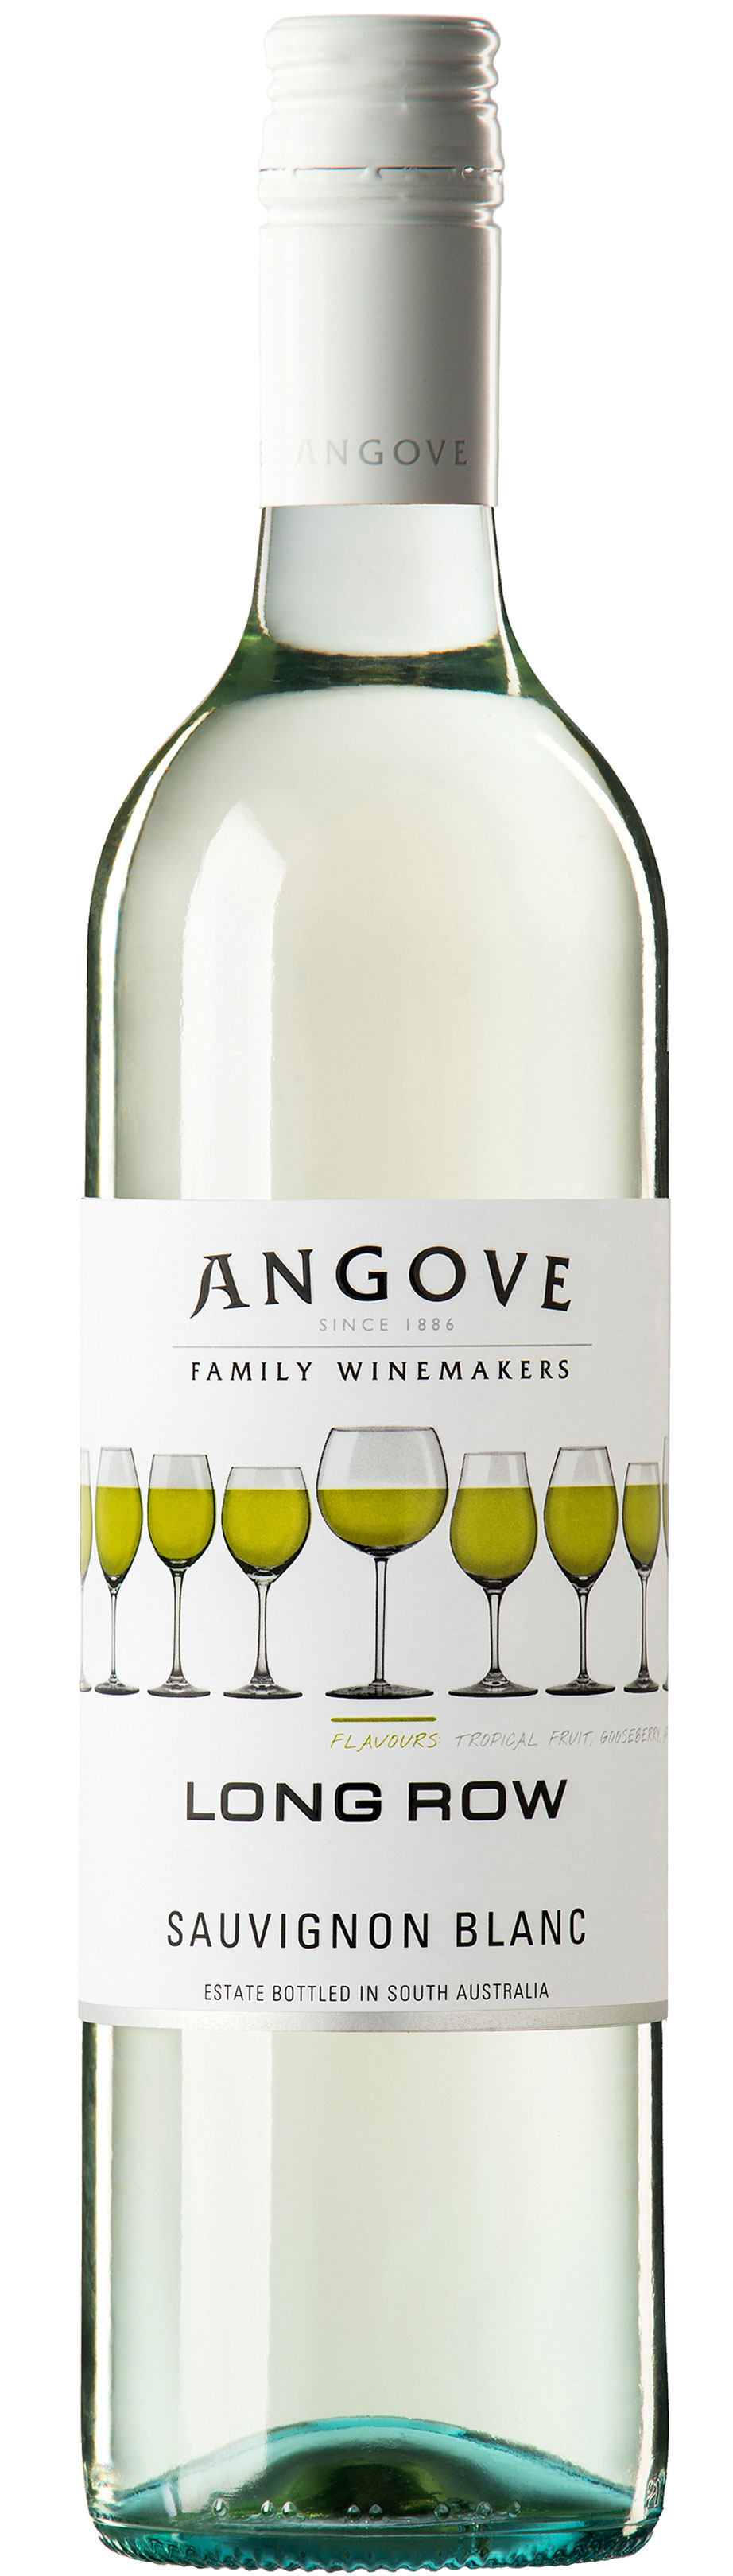 https://vinocorpperu.com/images/vinos/angove/long_row_sauvignon_blanc_2018.jpg